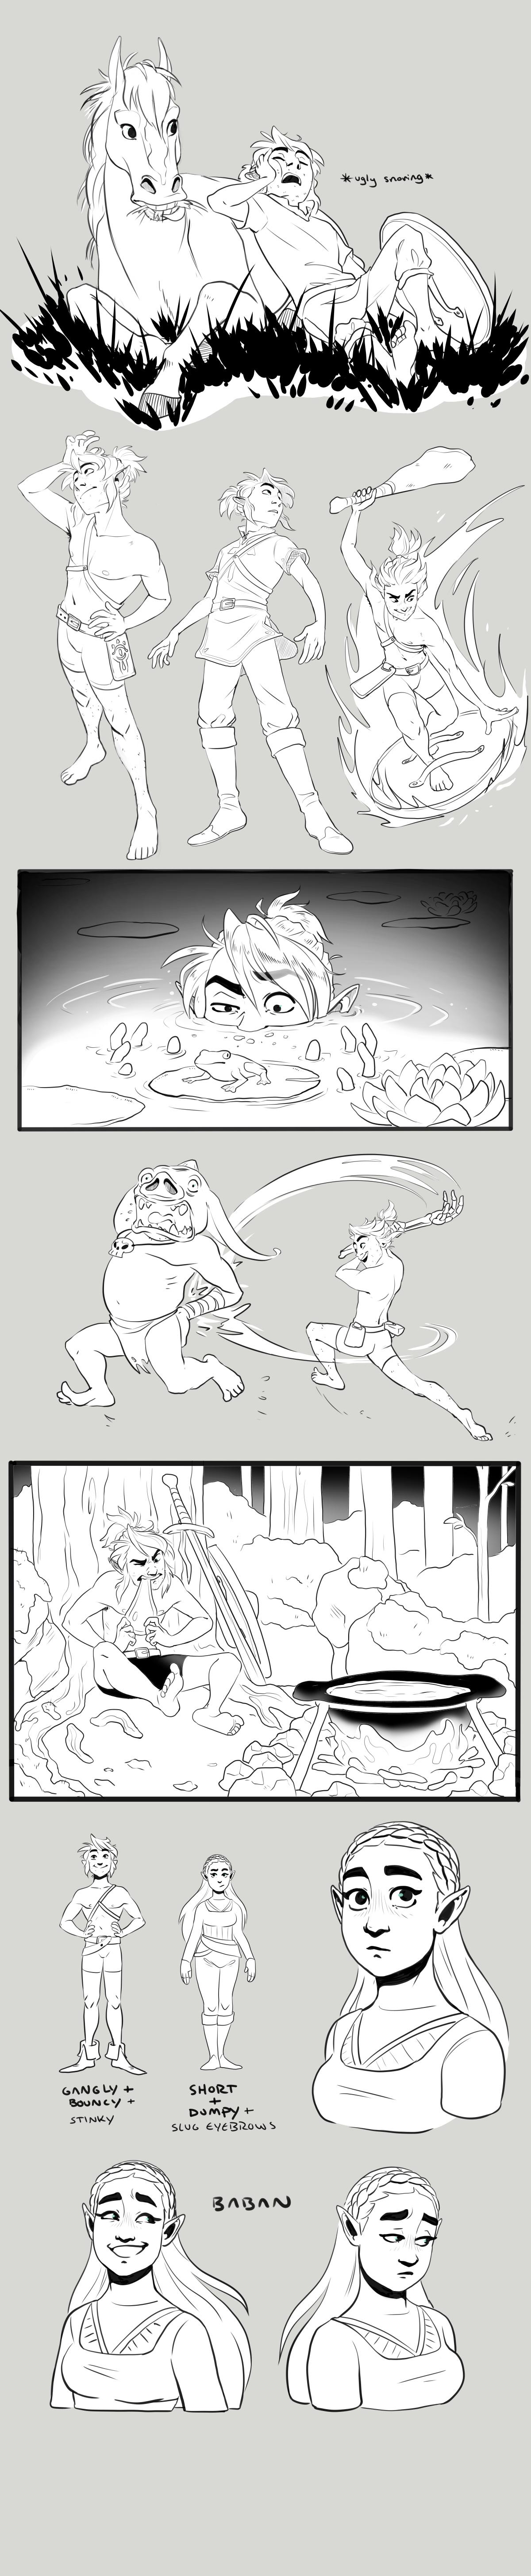 botw sketchdump by BabaKinkin